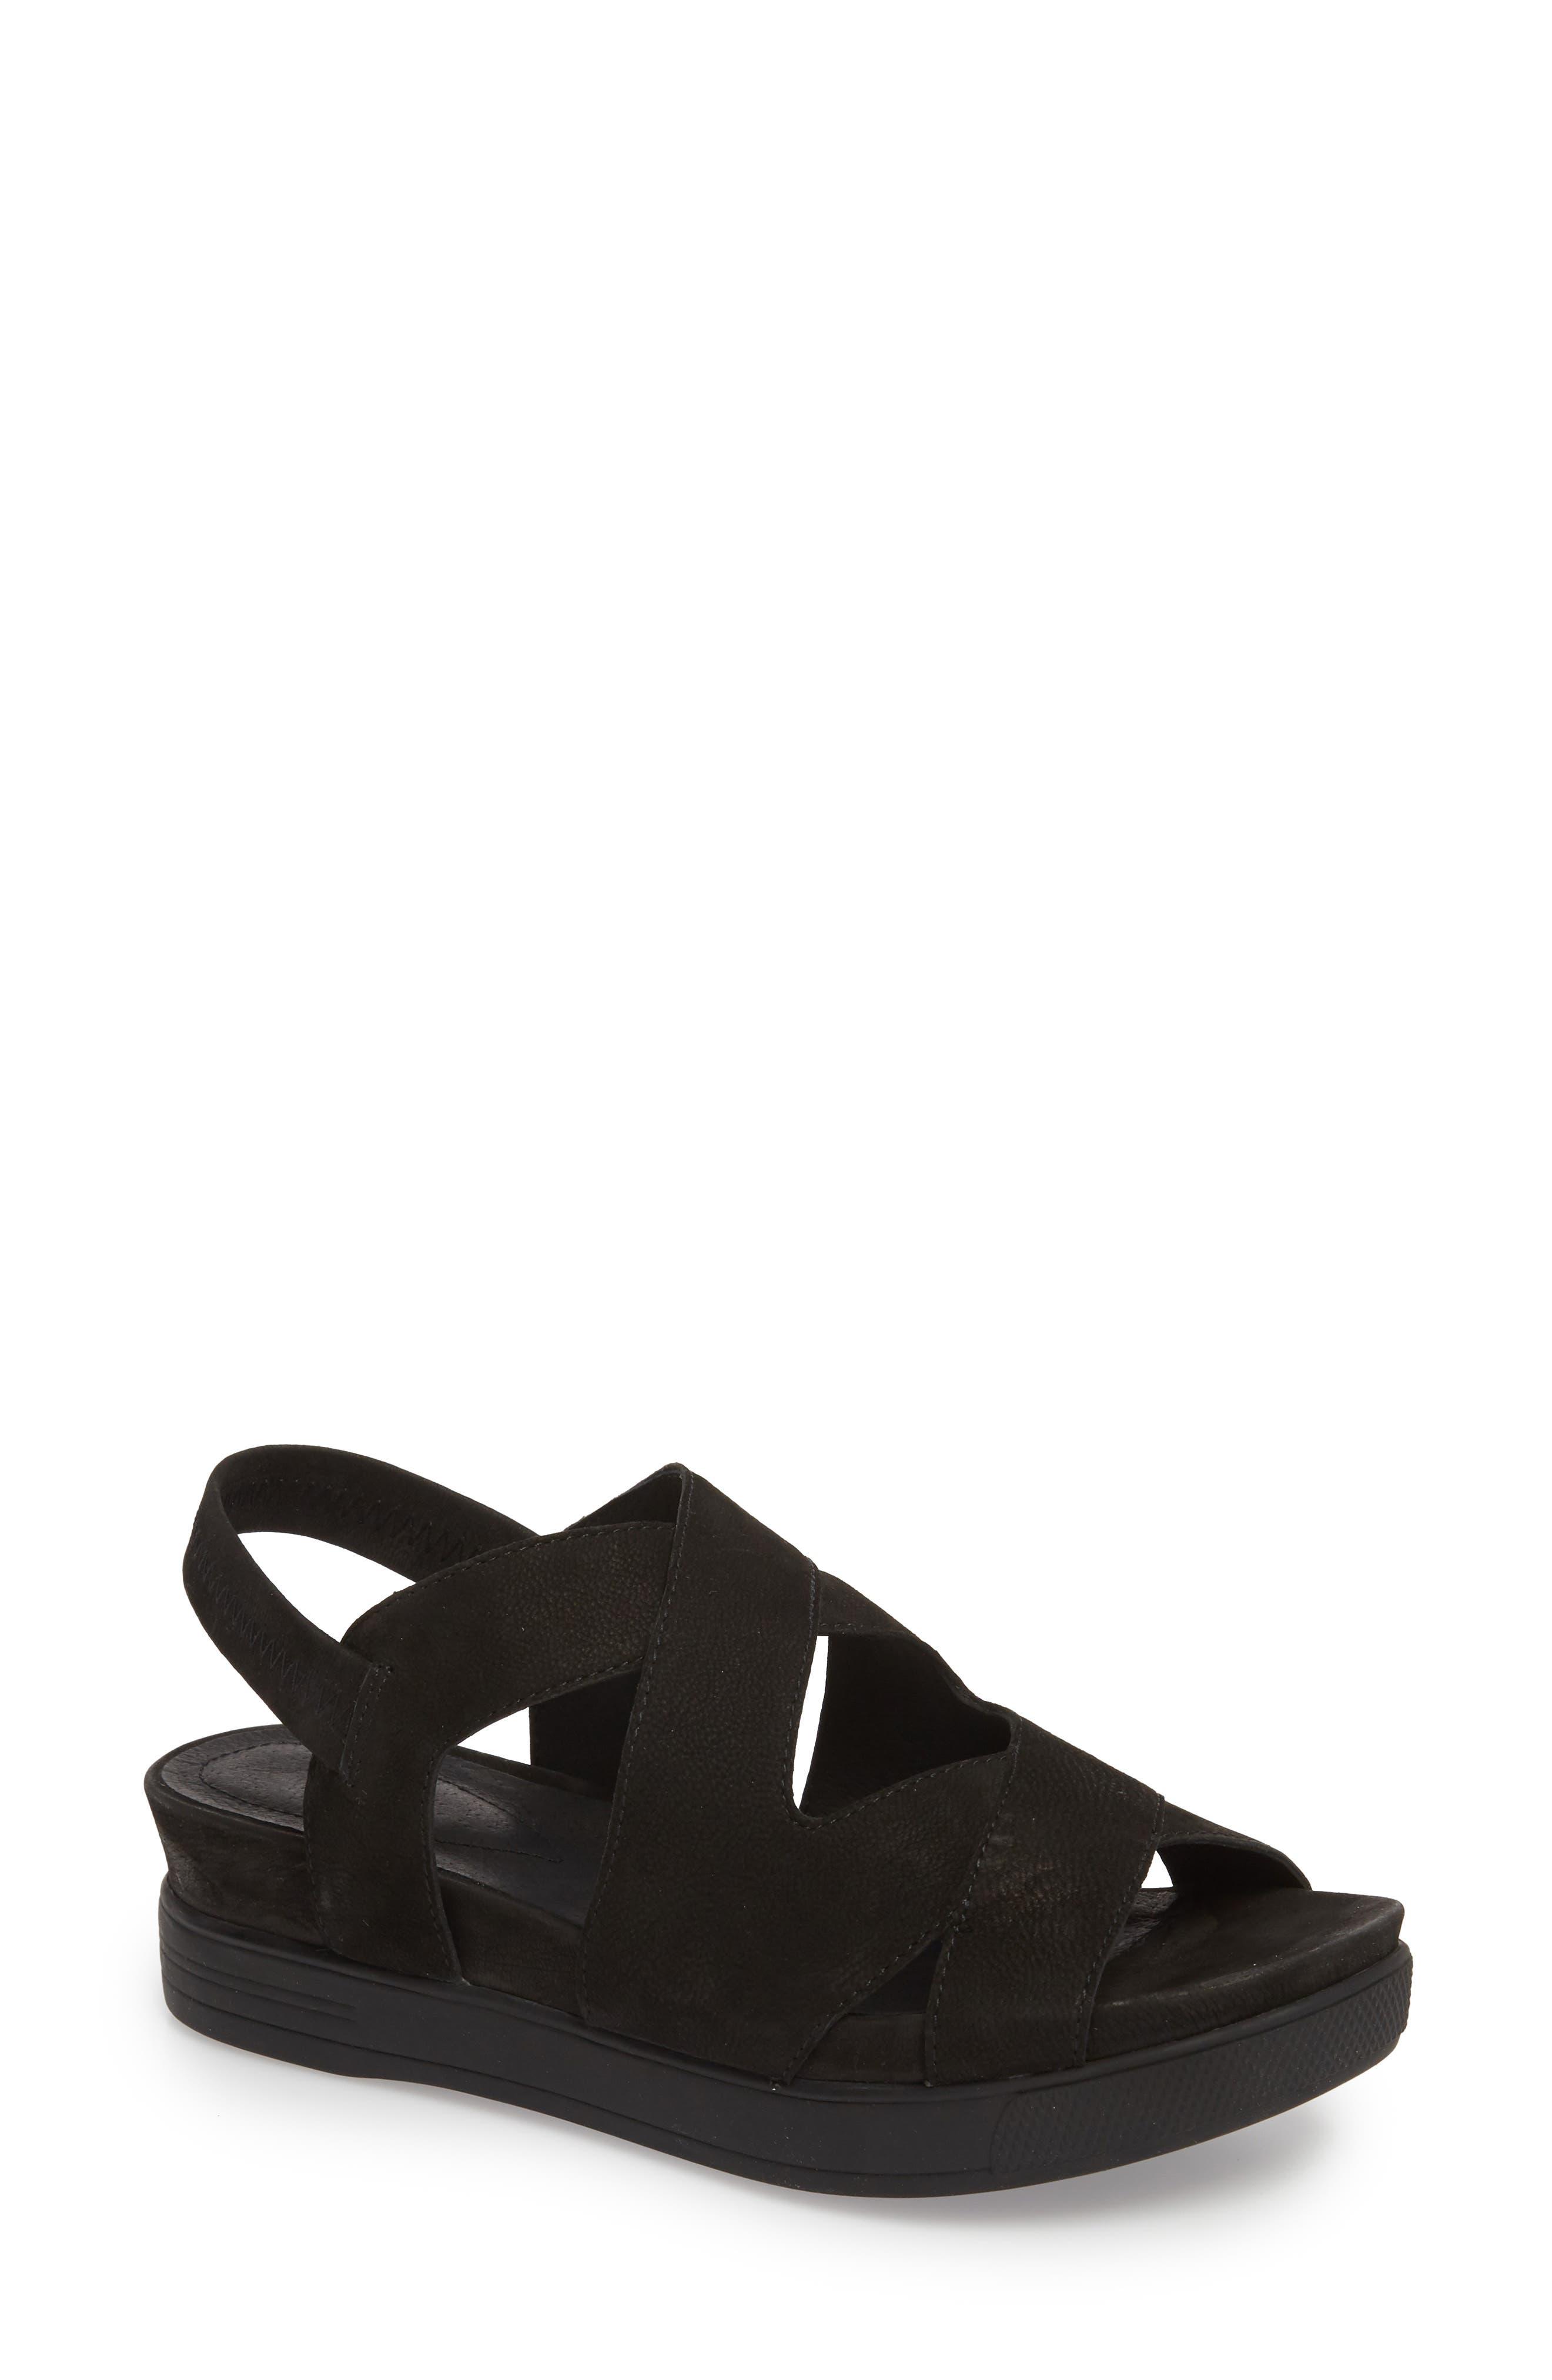 Sonny Sandal,                         Main,                         color, Black Nubuck Leather